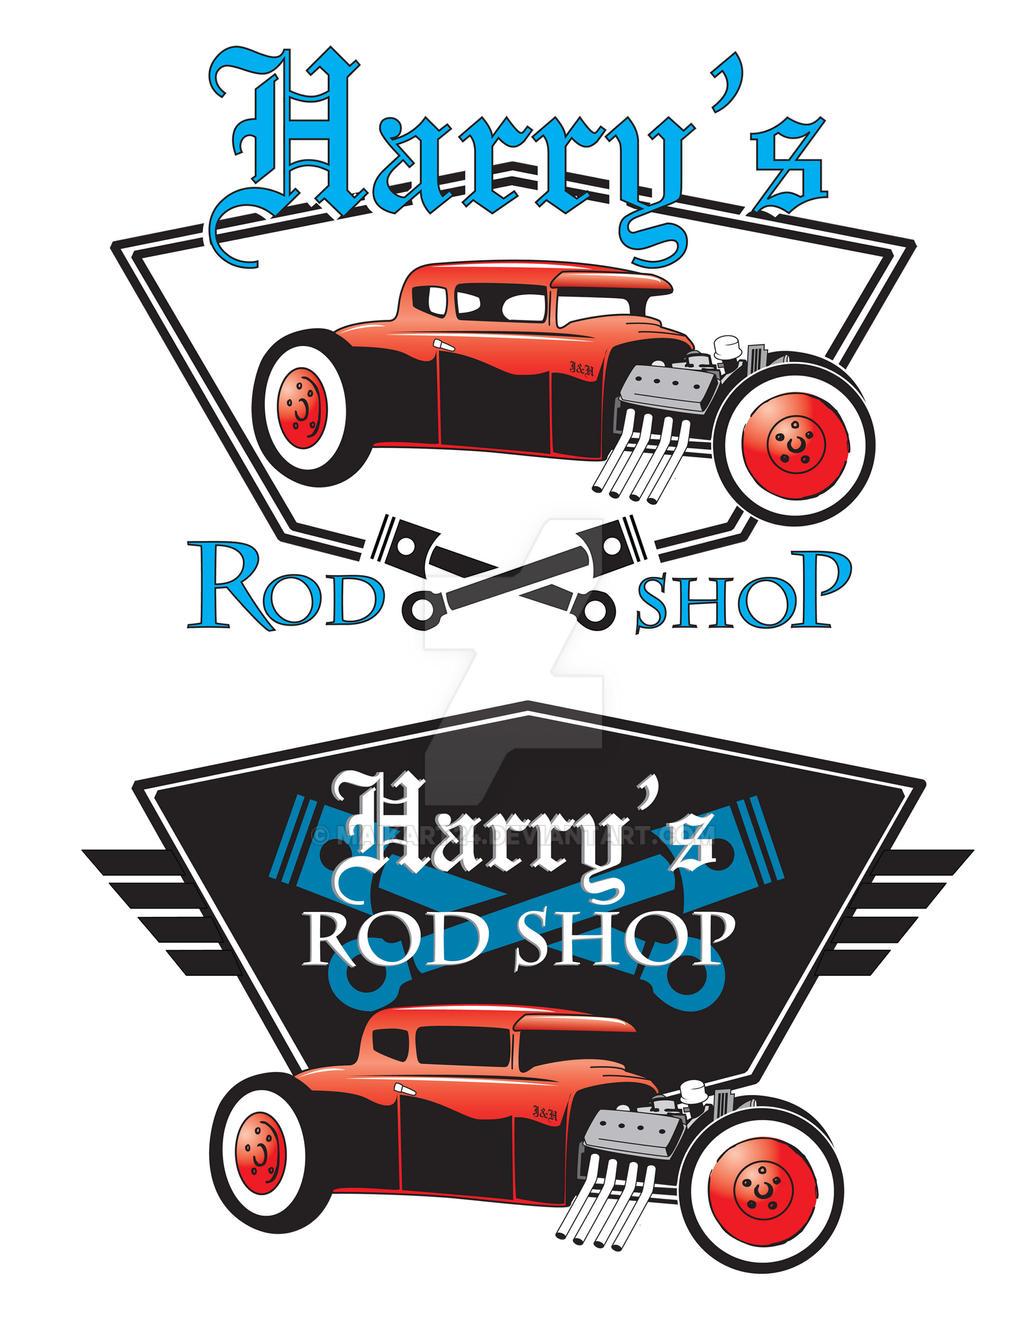 Logos for a Hot Rod Shop by Maikart24 on DeviantArt